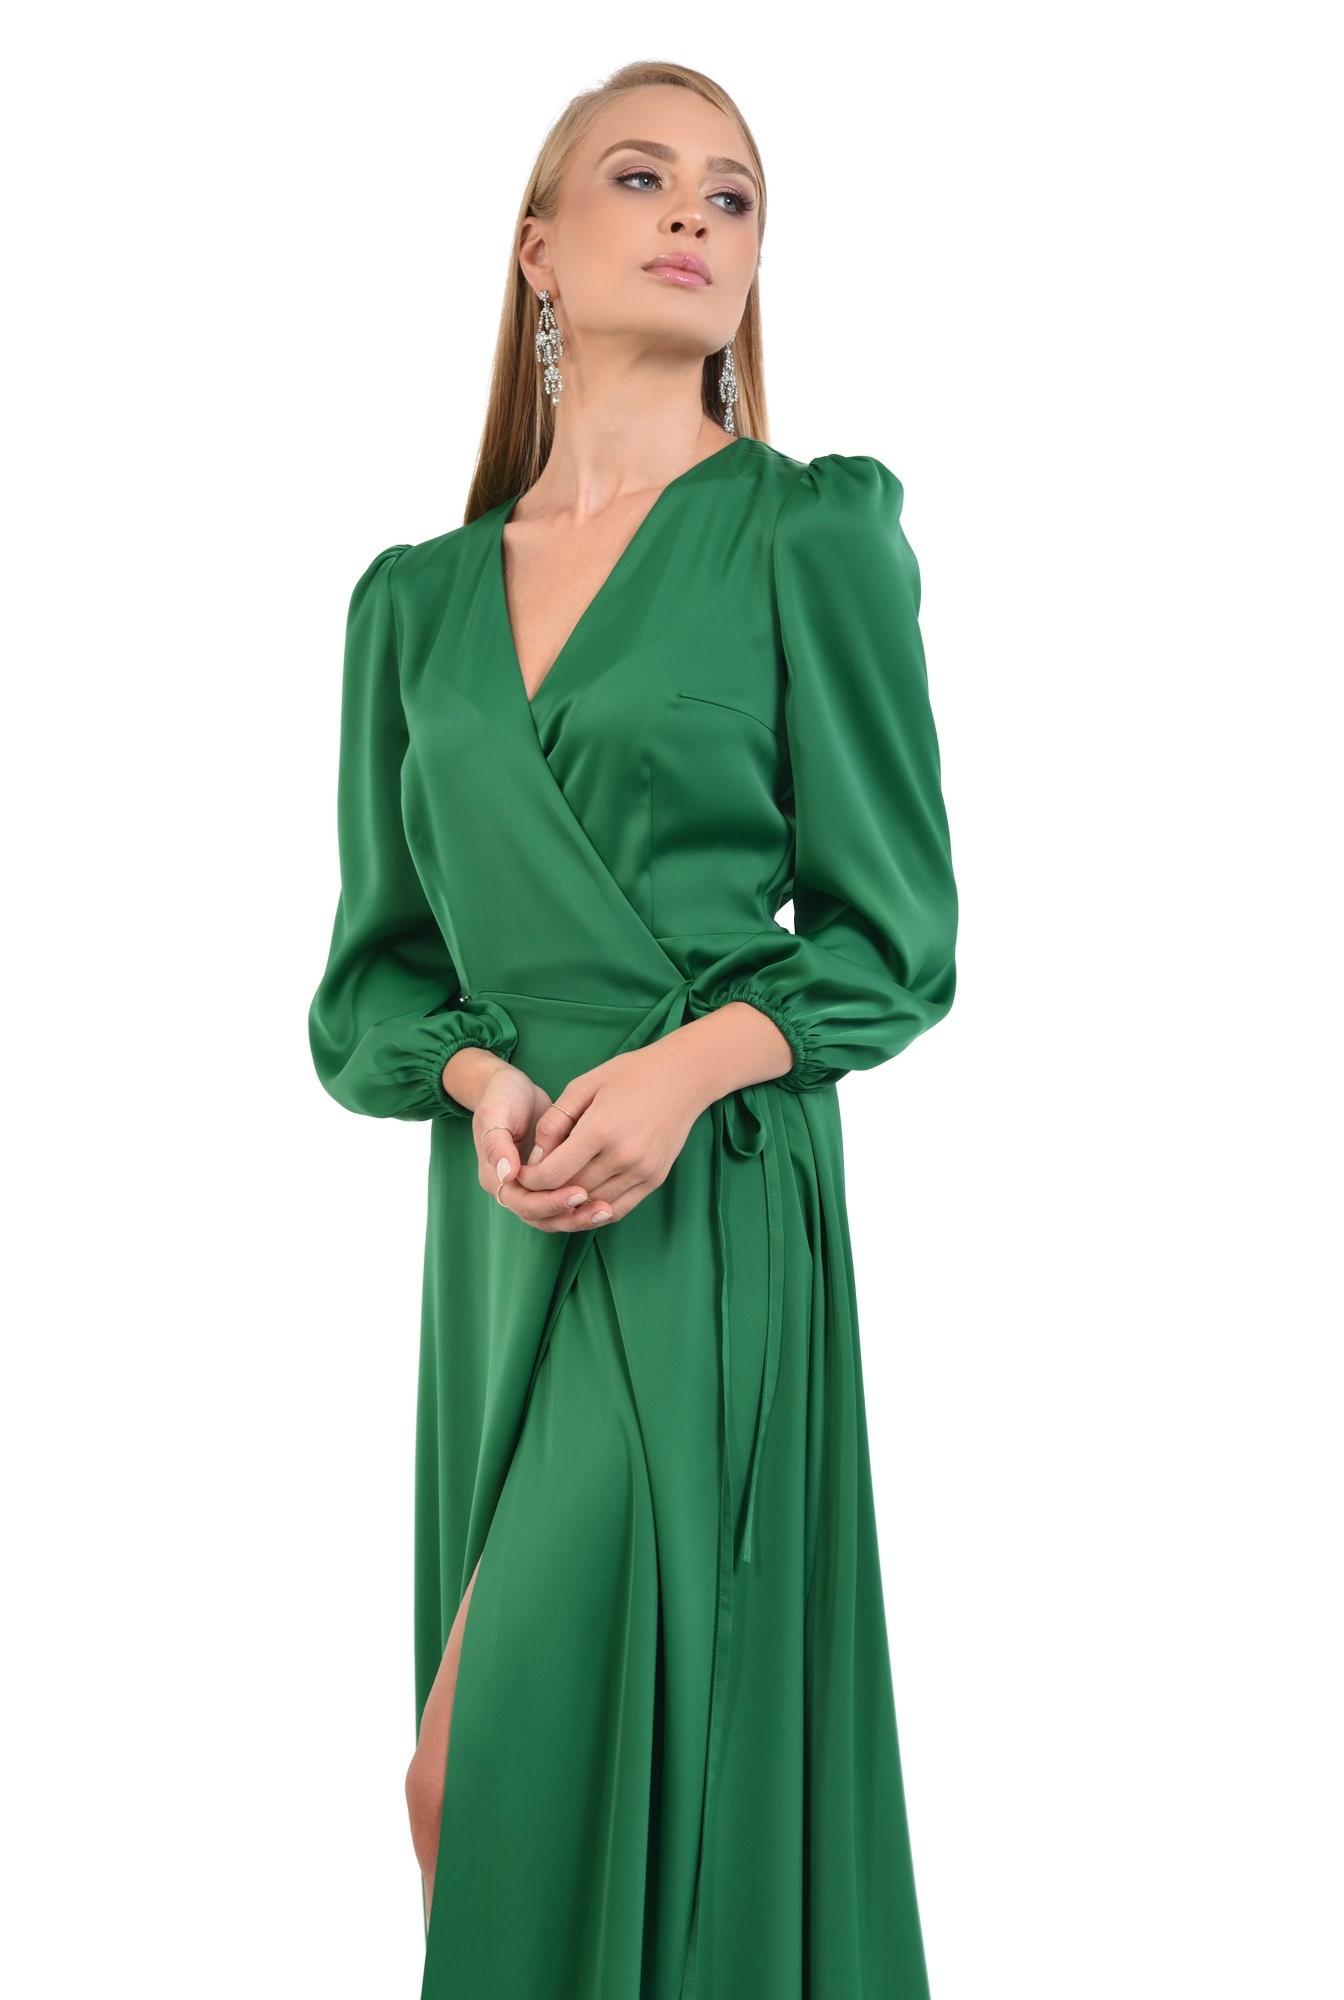 rochie de seara, slit adanc, verde, satin, rochie maxi